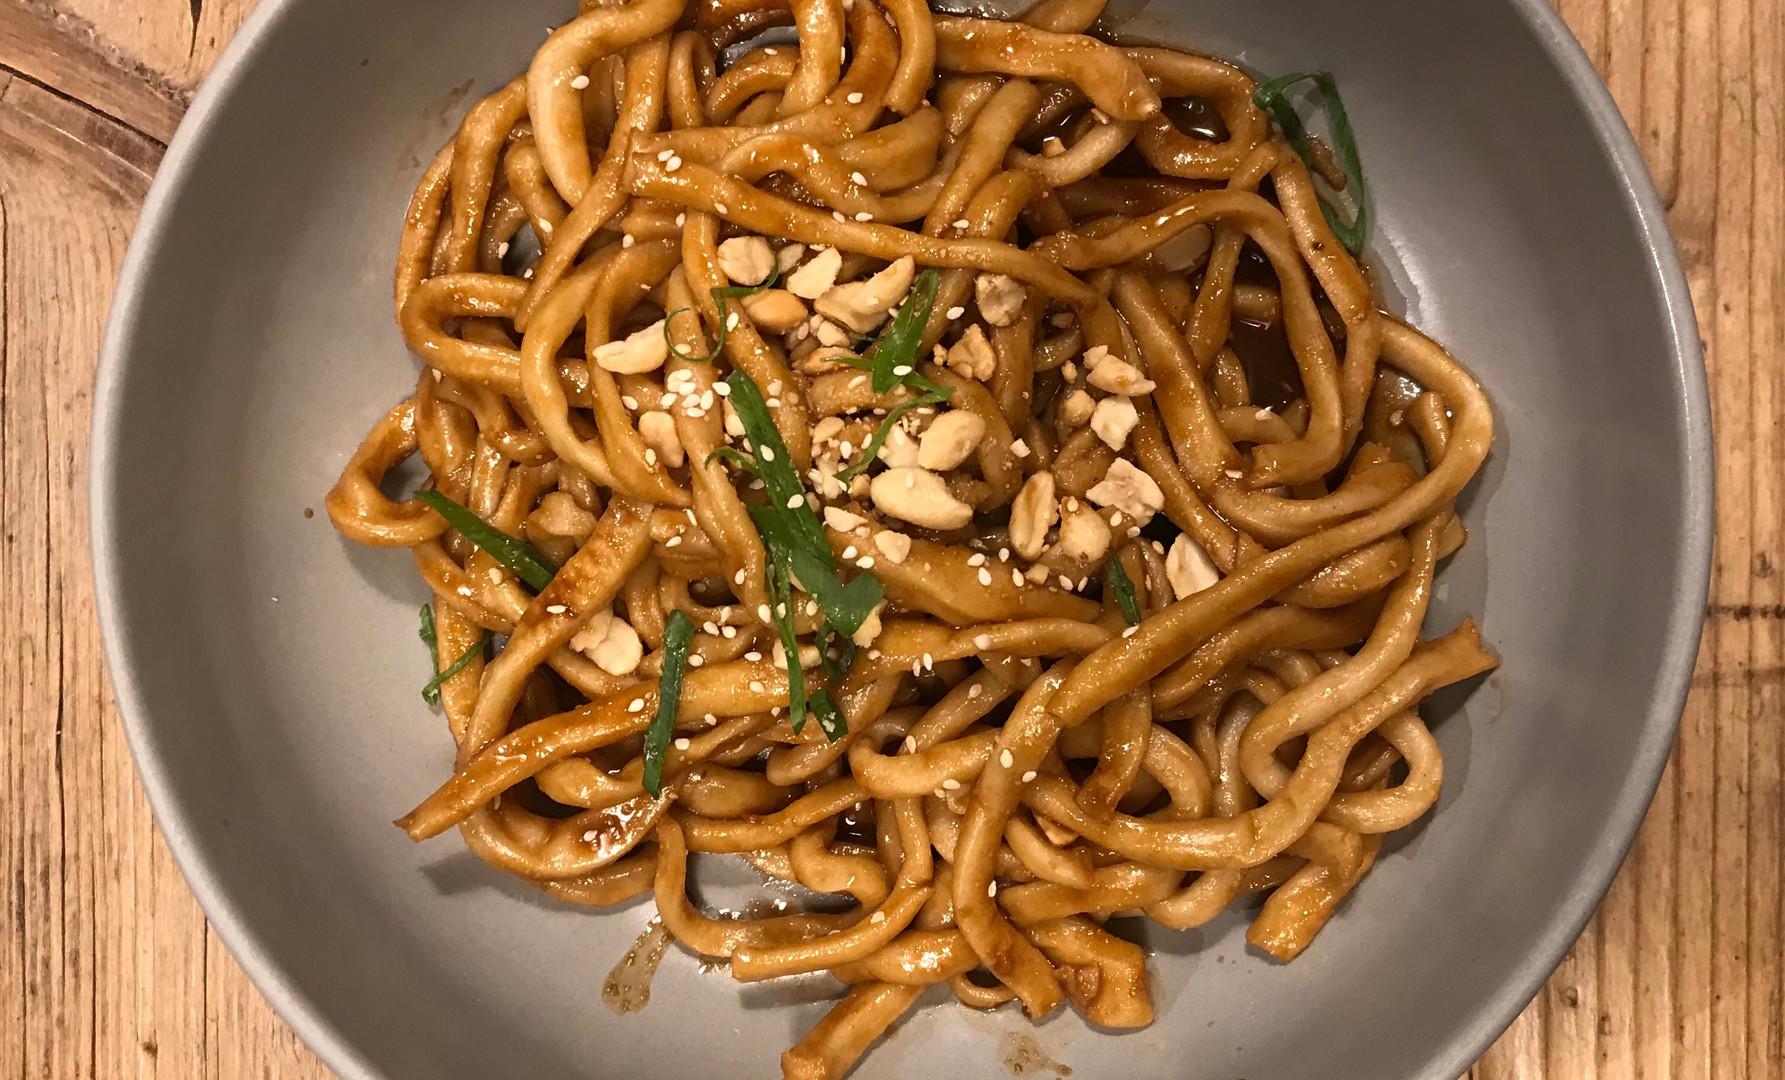 Spaghetti tirati a mano, salsa di sesamo e pepe di Sichuan